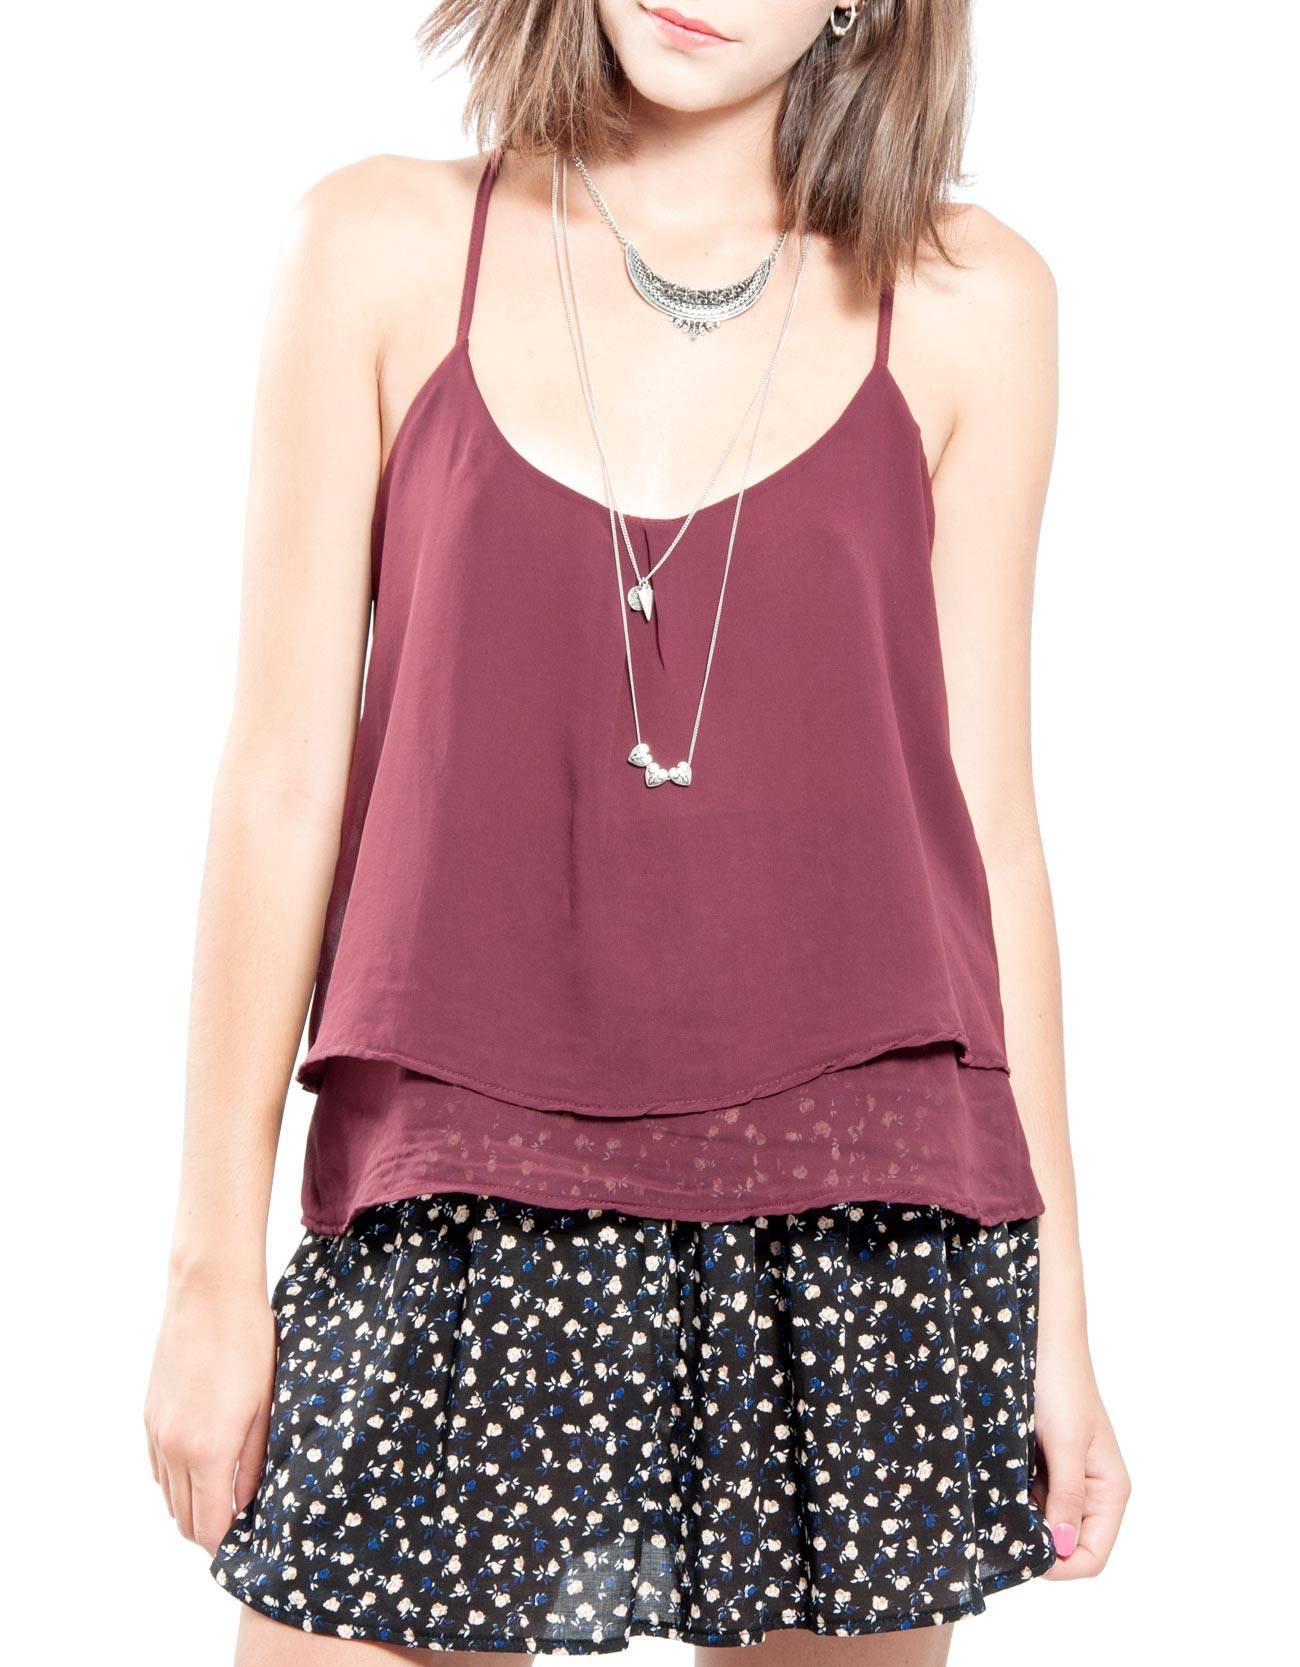 Blusa sin manga doble capa : ROPA Blusas & Camisas